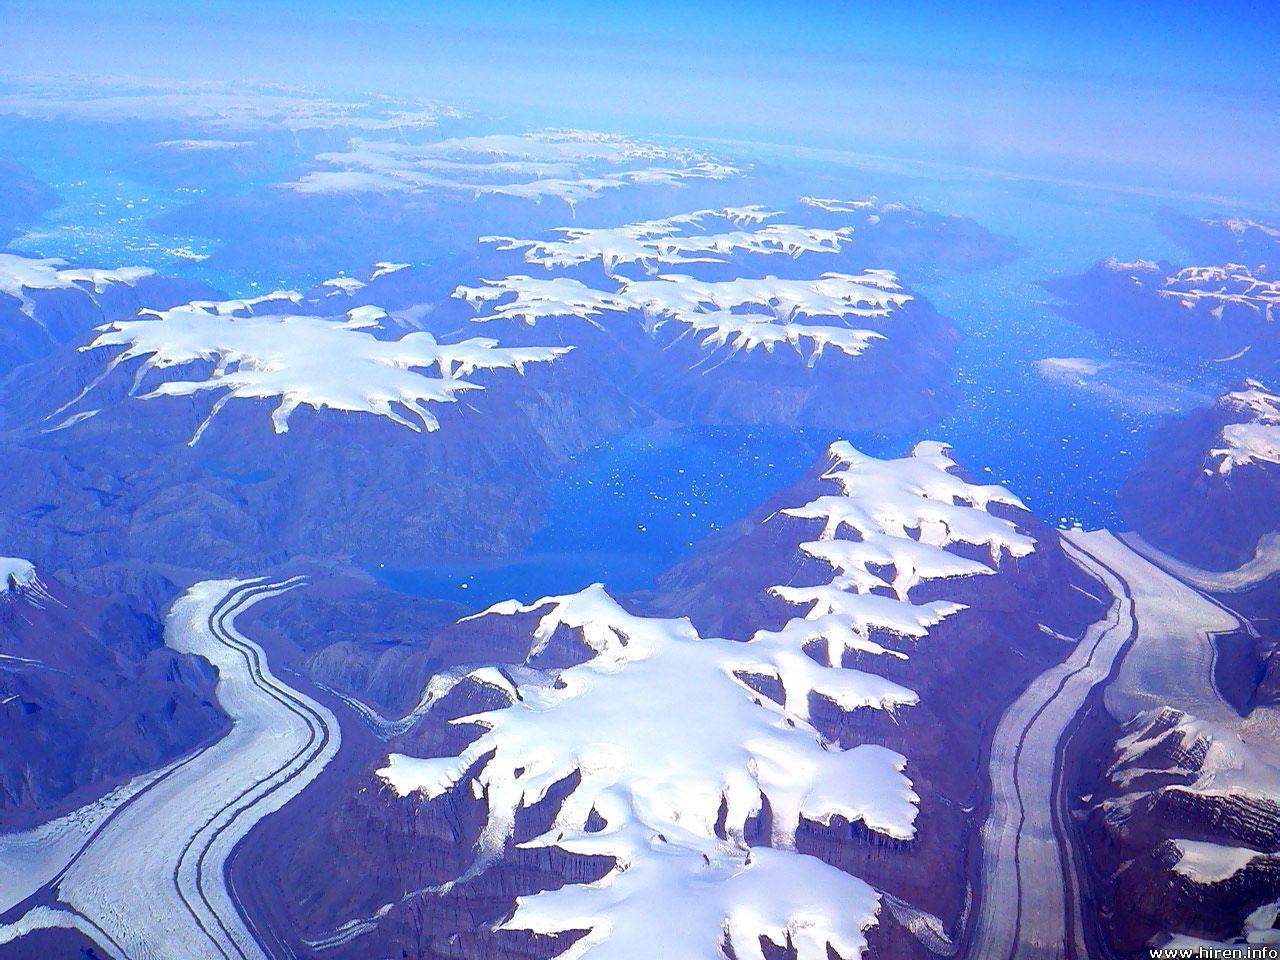 Stonehenge and the Ice Age: Plateau ice caps, Greenland